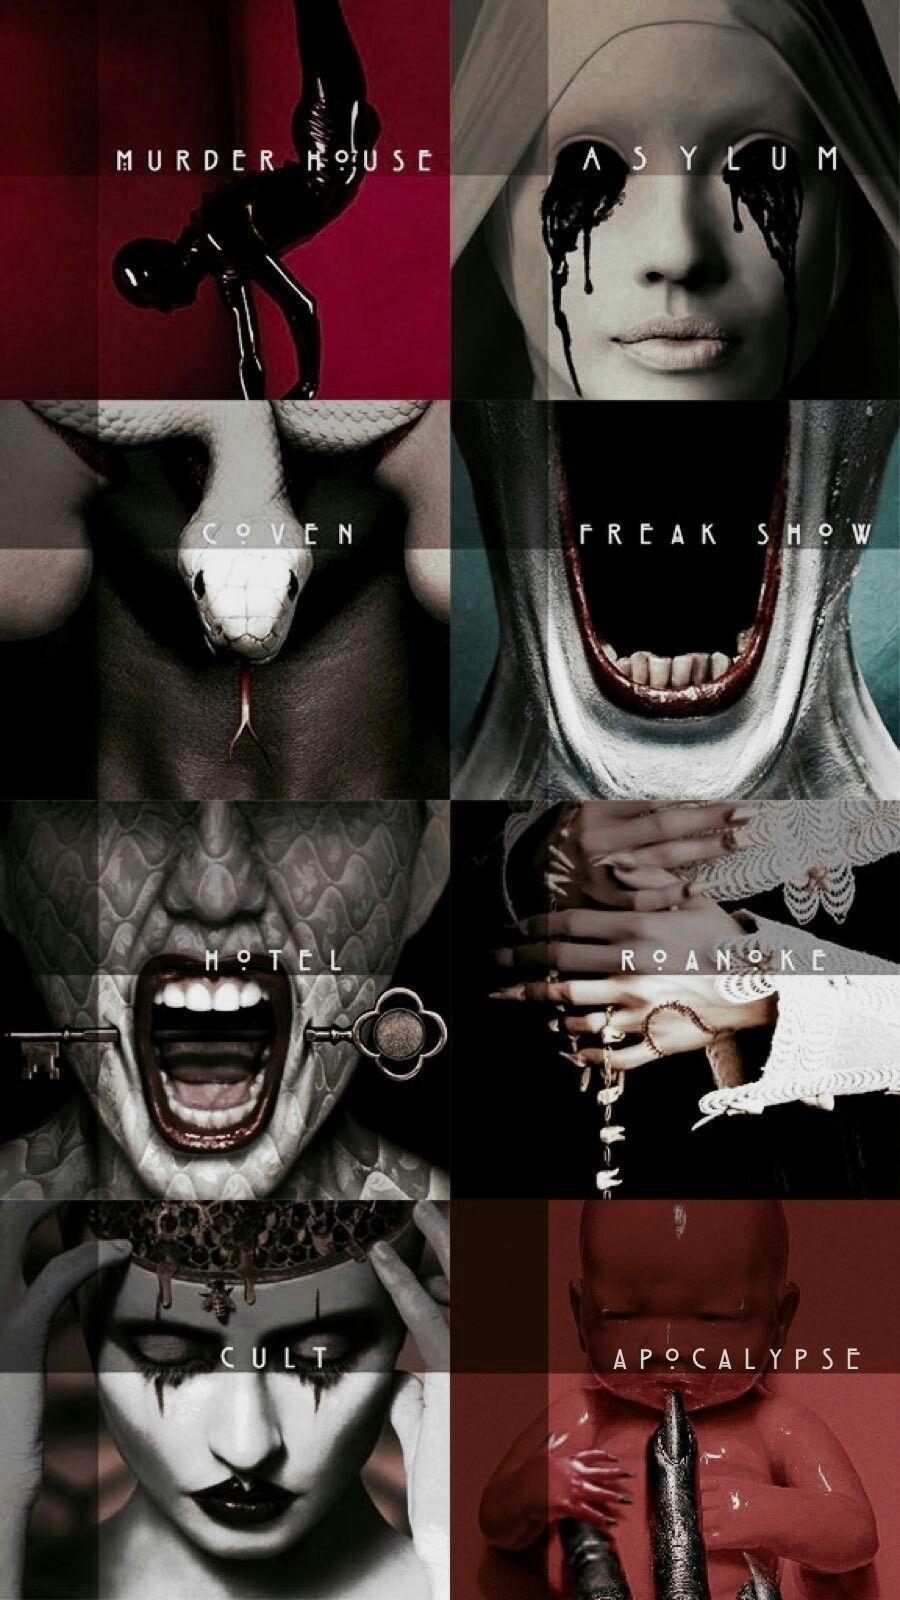 American horror story all seasons wallpaper Histórias de